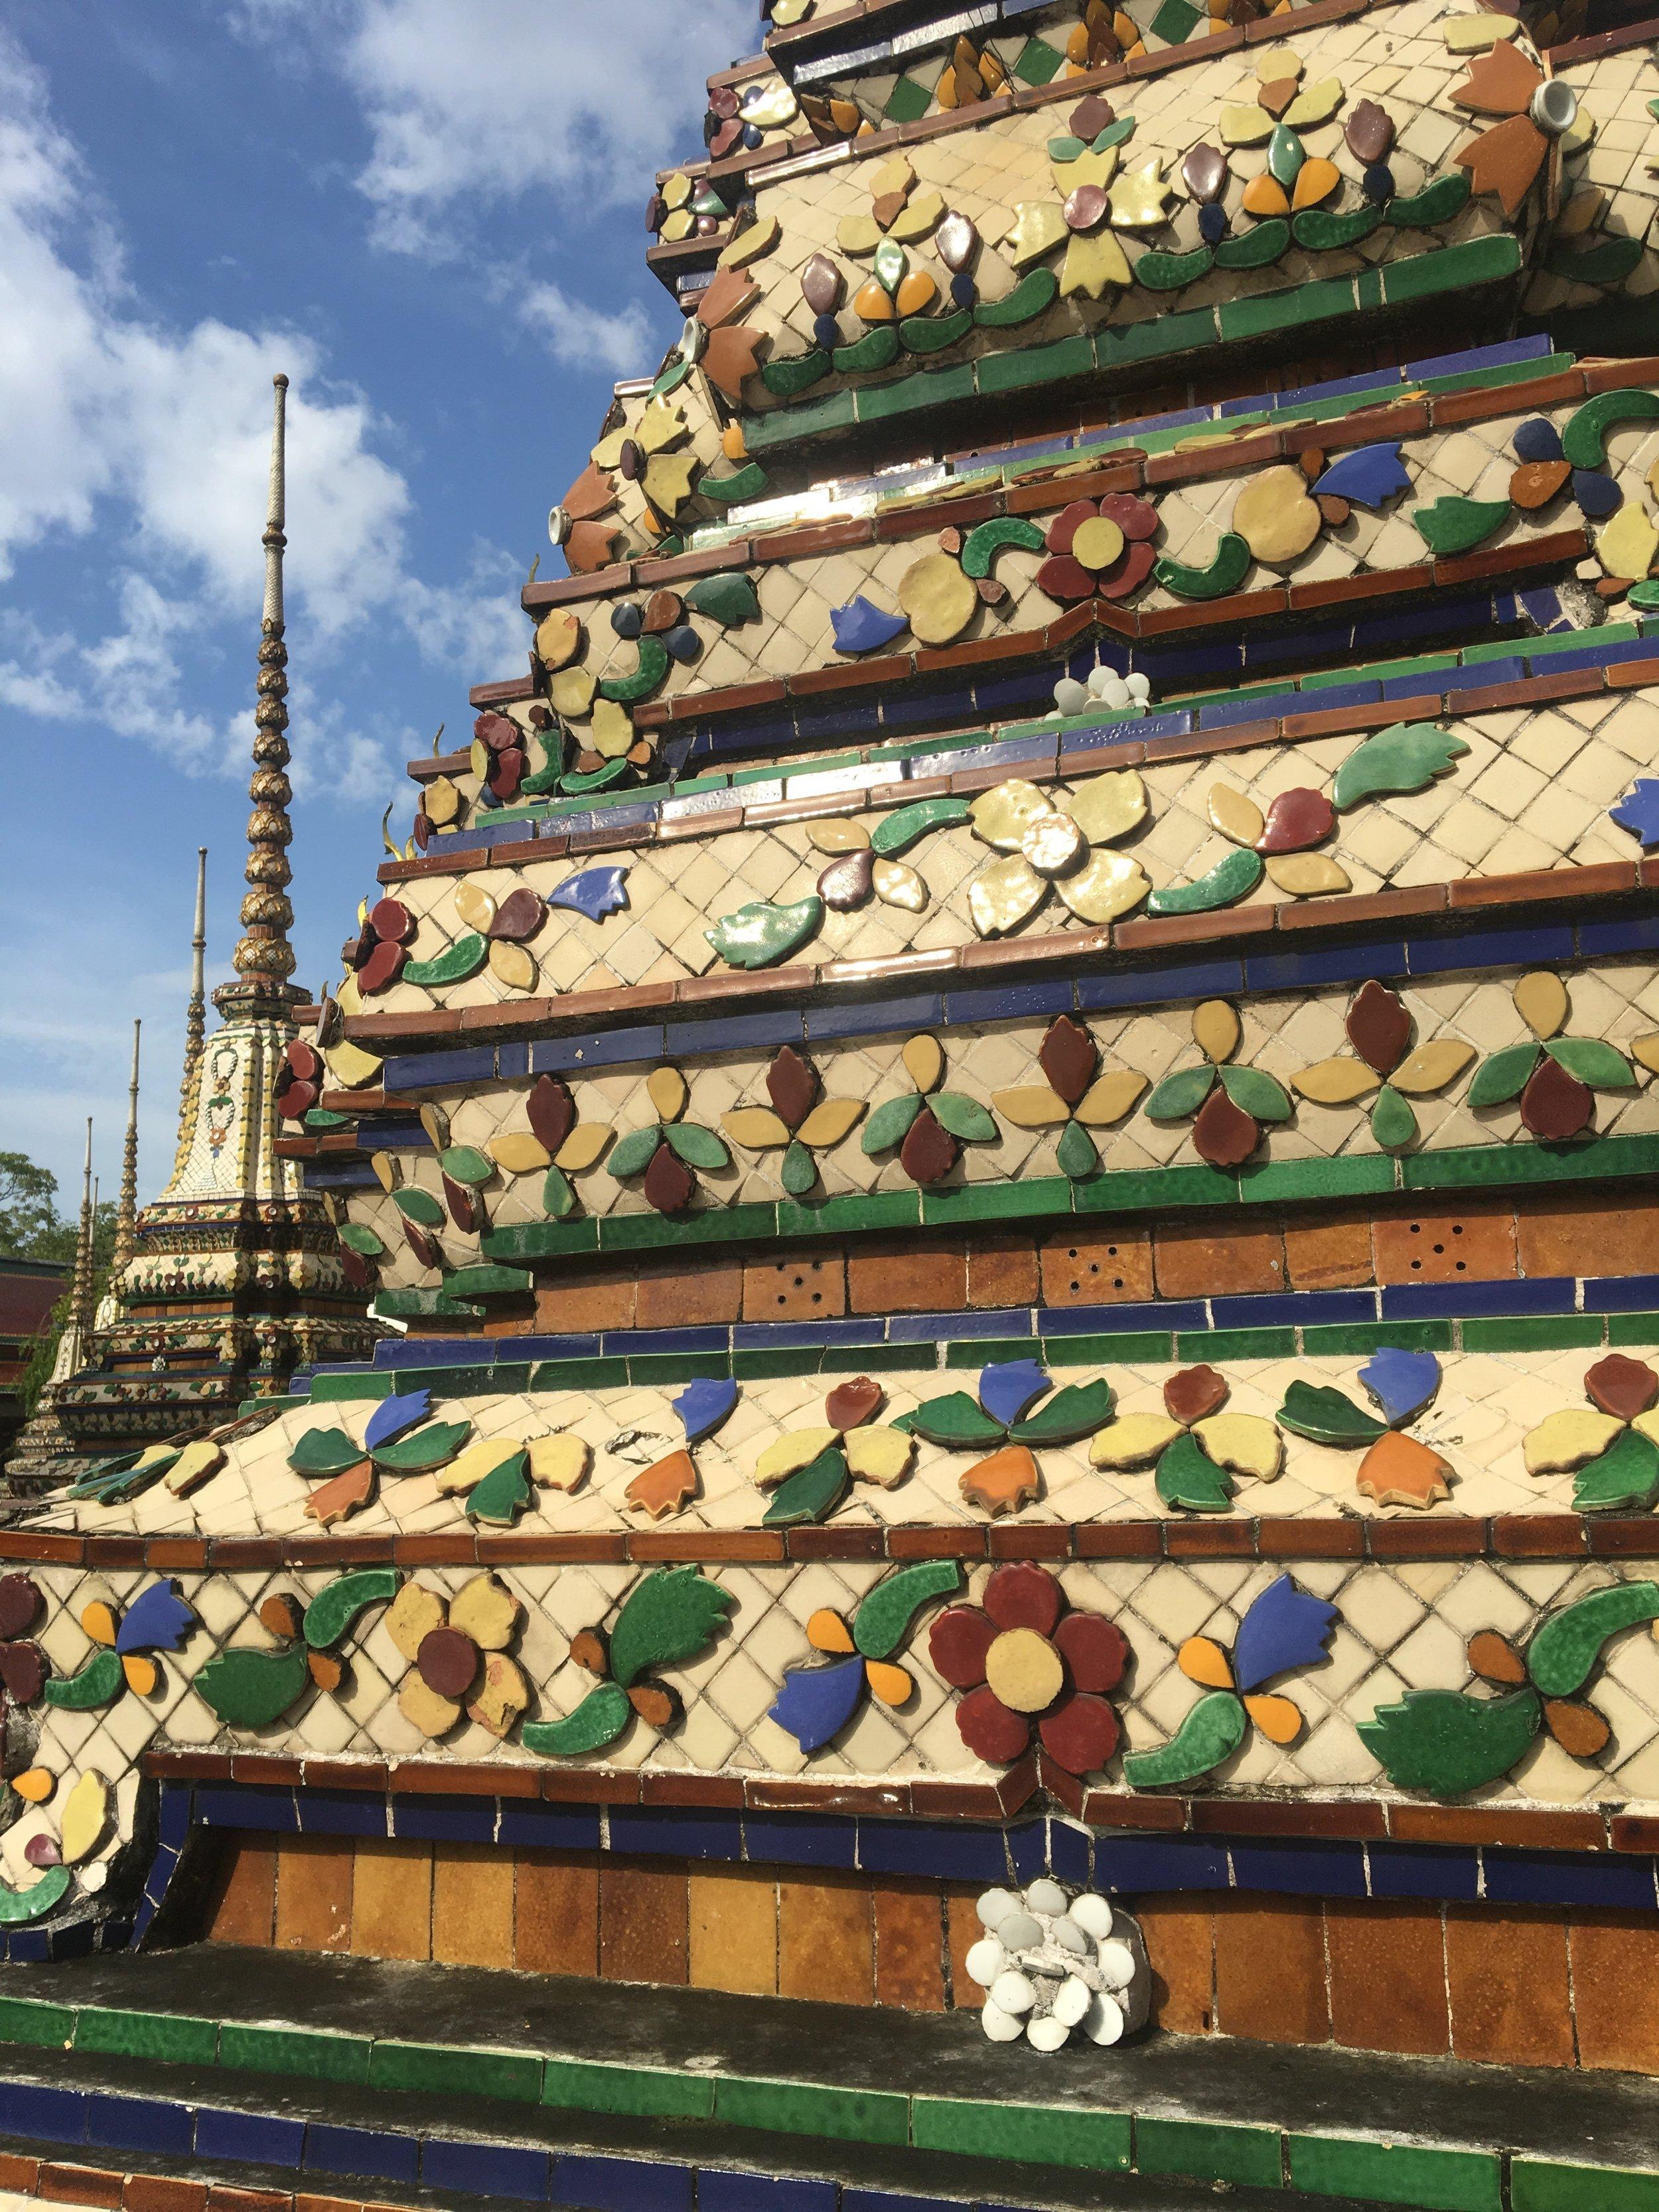 Temple complex at Wat Pho in Bangkok